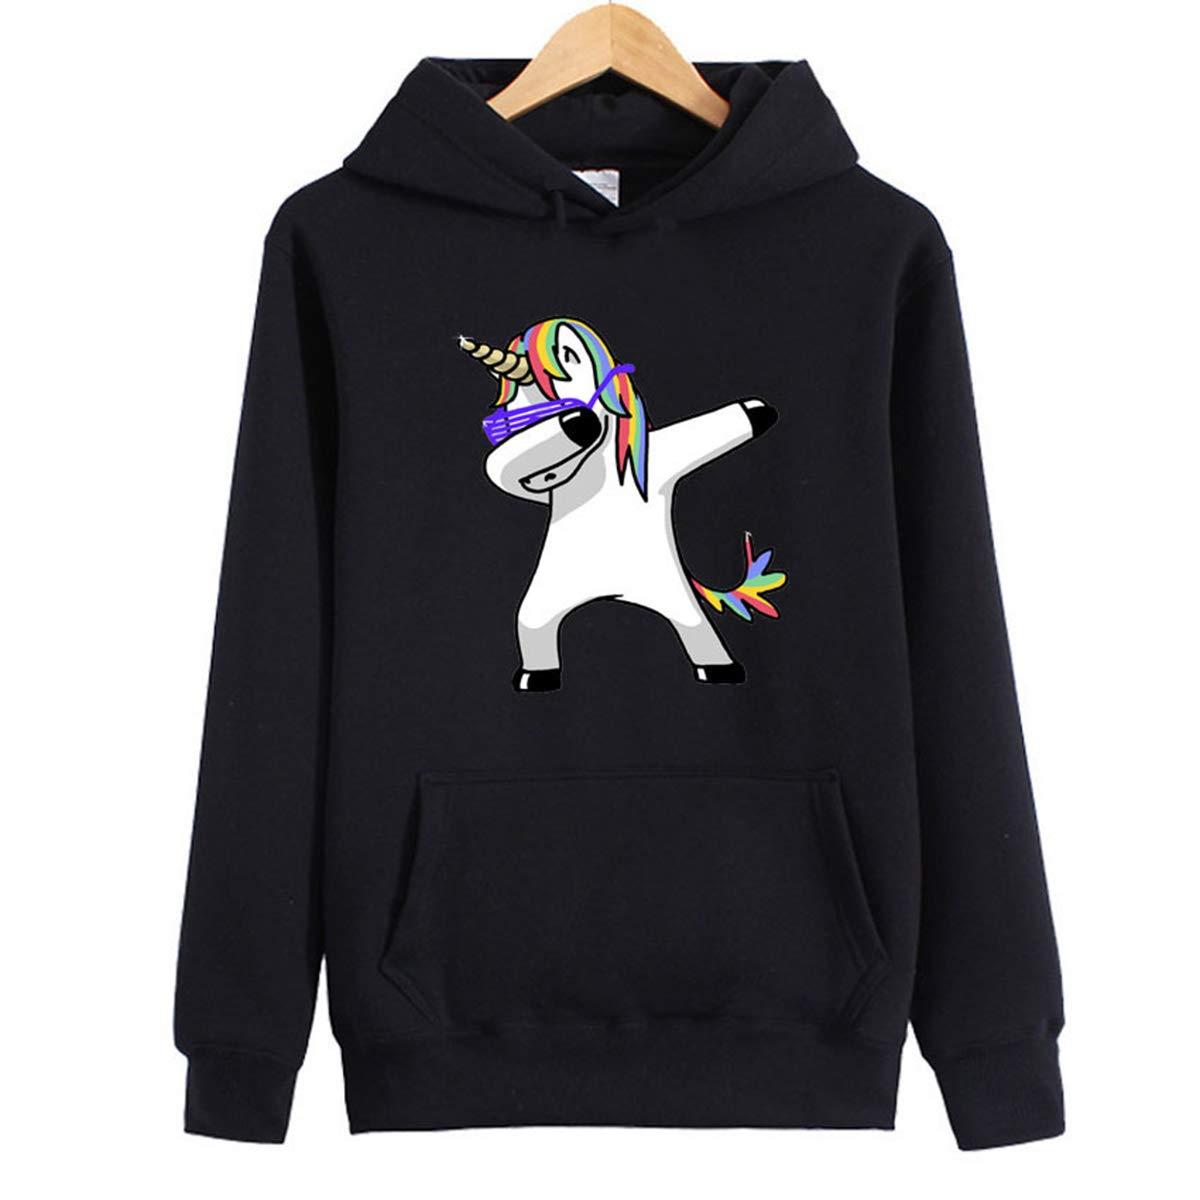 Amazon.com: oboss Cute Unicorn Rainbow Pullover Hoodie Sweatshirt Long Sleeve Sweater Hoodie for Girls and Women: Clothing